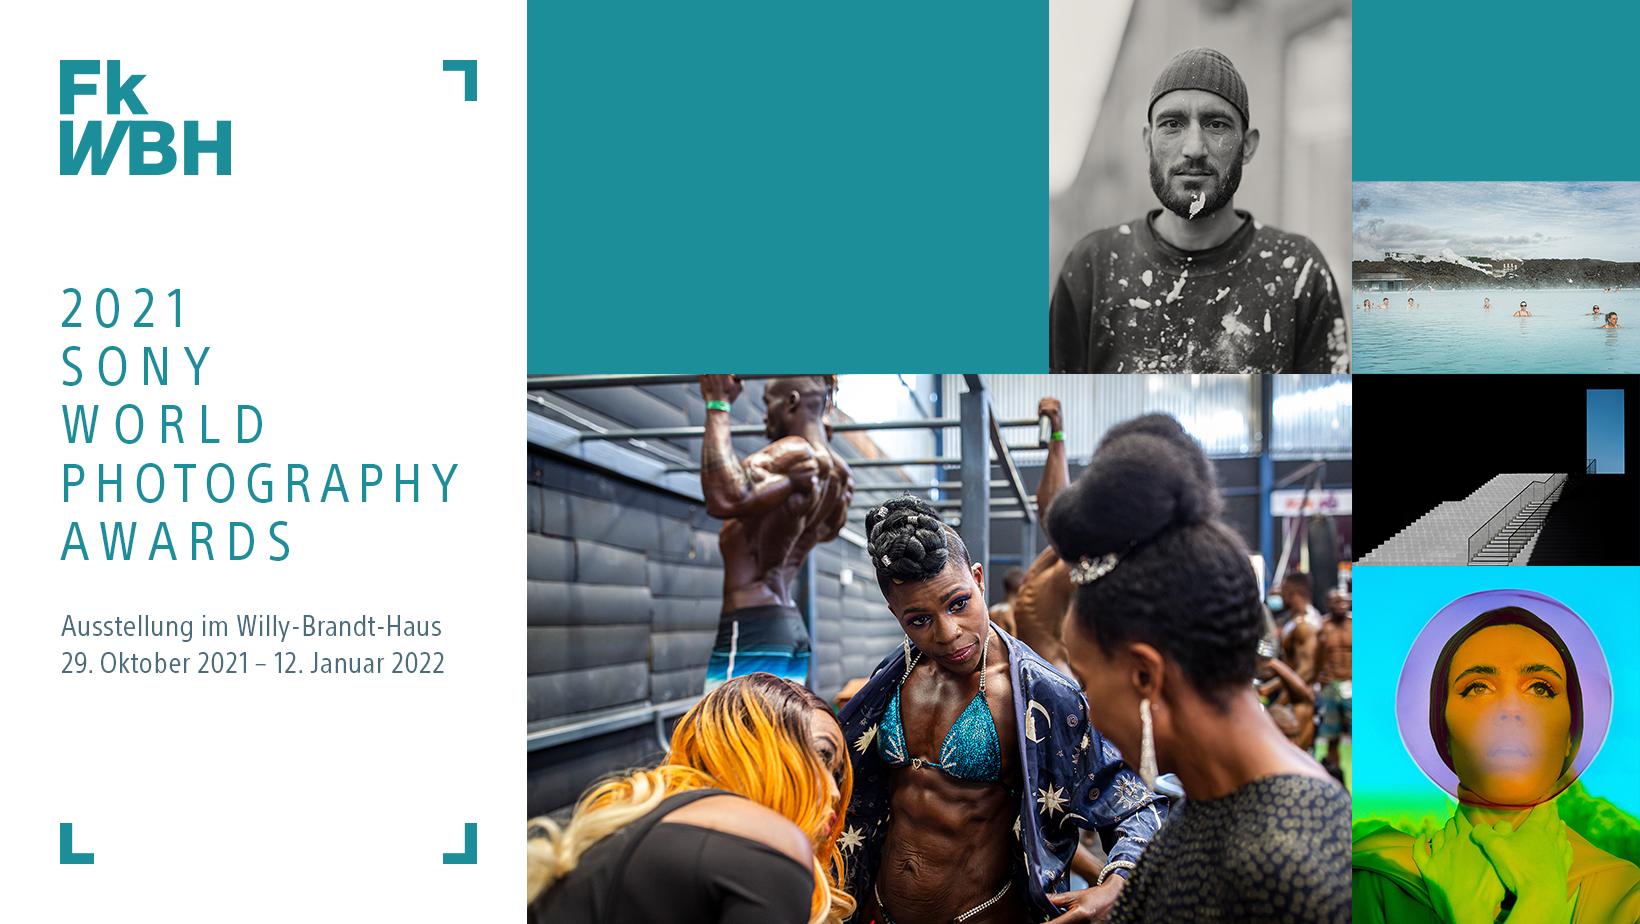 World Photography Awards in Berlin